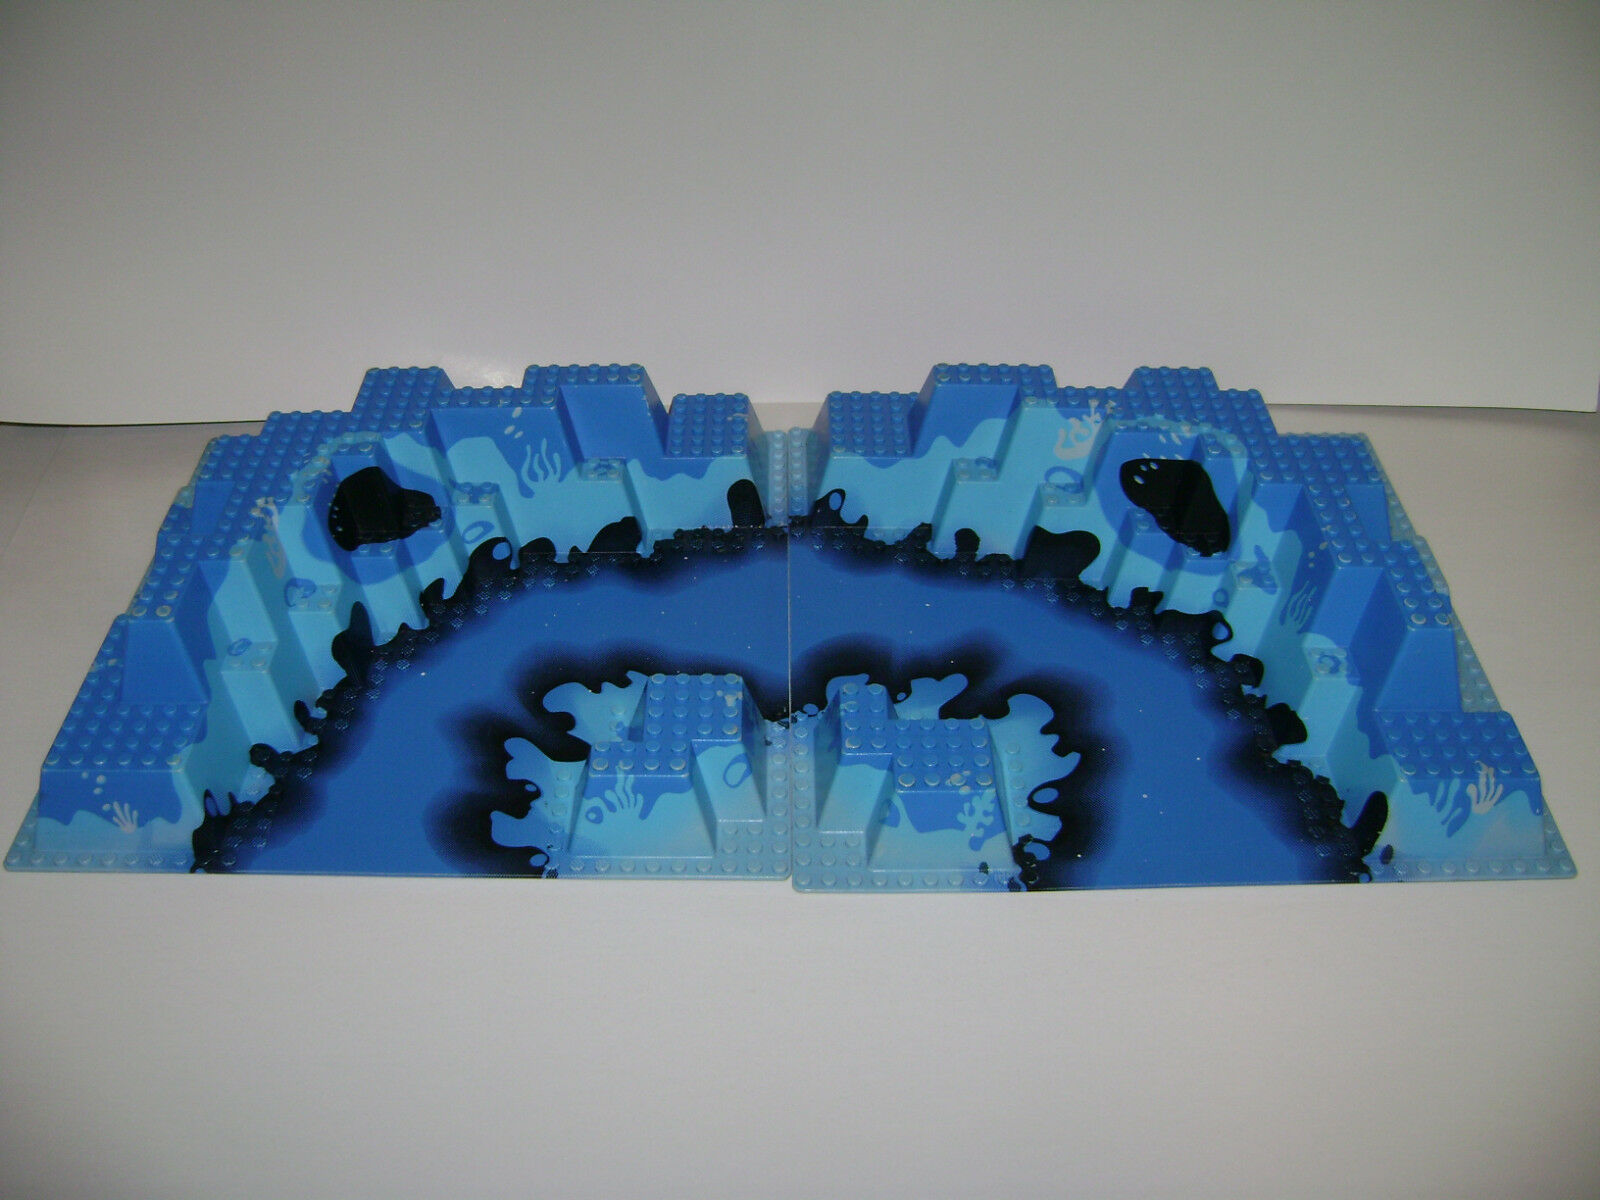 Vintage Lego Raised Base Plate 32X32 6024 Neptune Discovery Lab Blau Lot Of 2